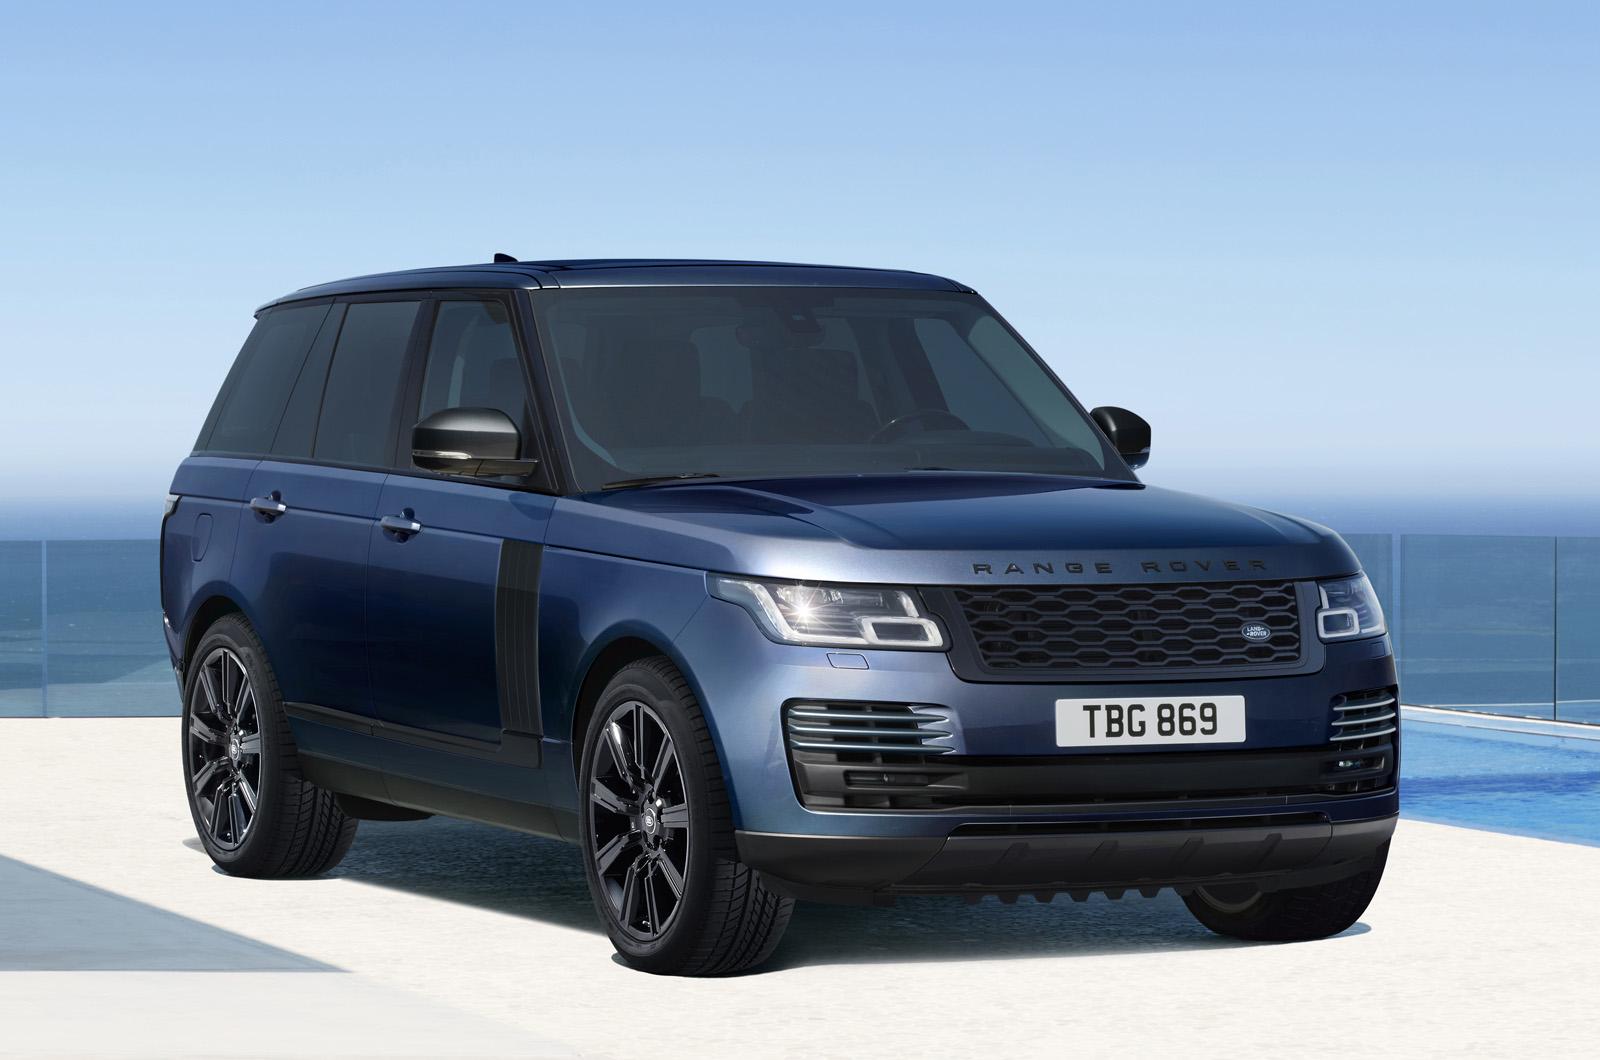 2021 Range Rover swaps diesel engines for mild-hybrid straight-six